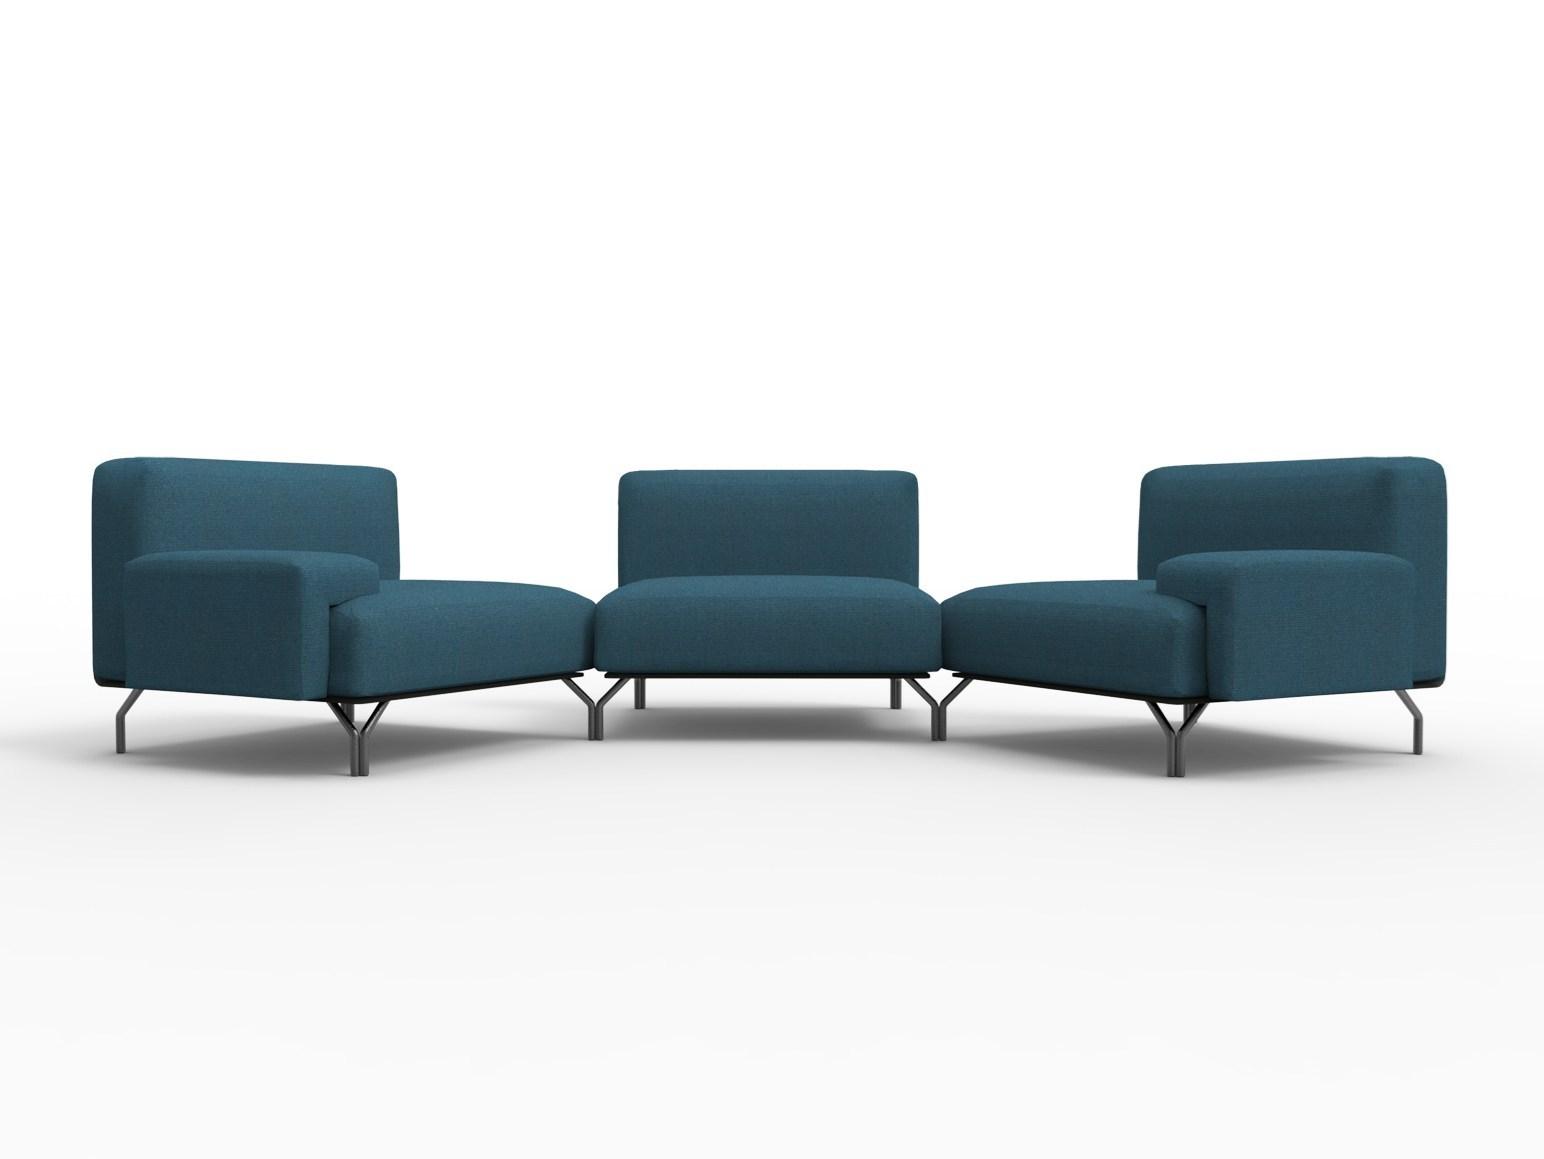 SUMMIT Modular Sofa by Giulio Iacchetti for Casamania